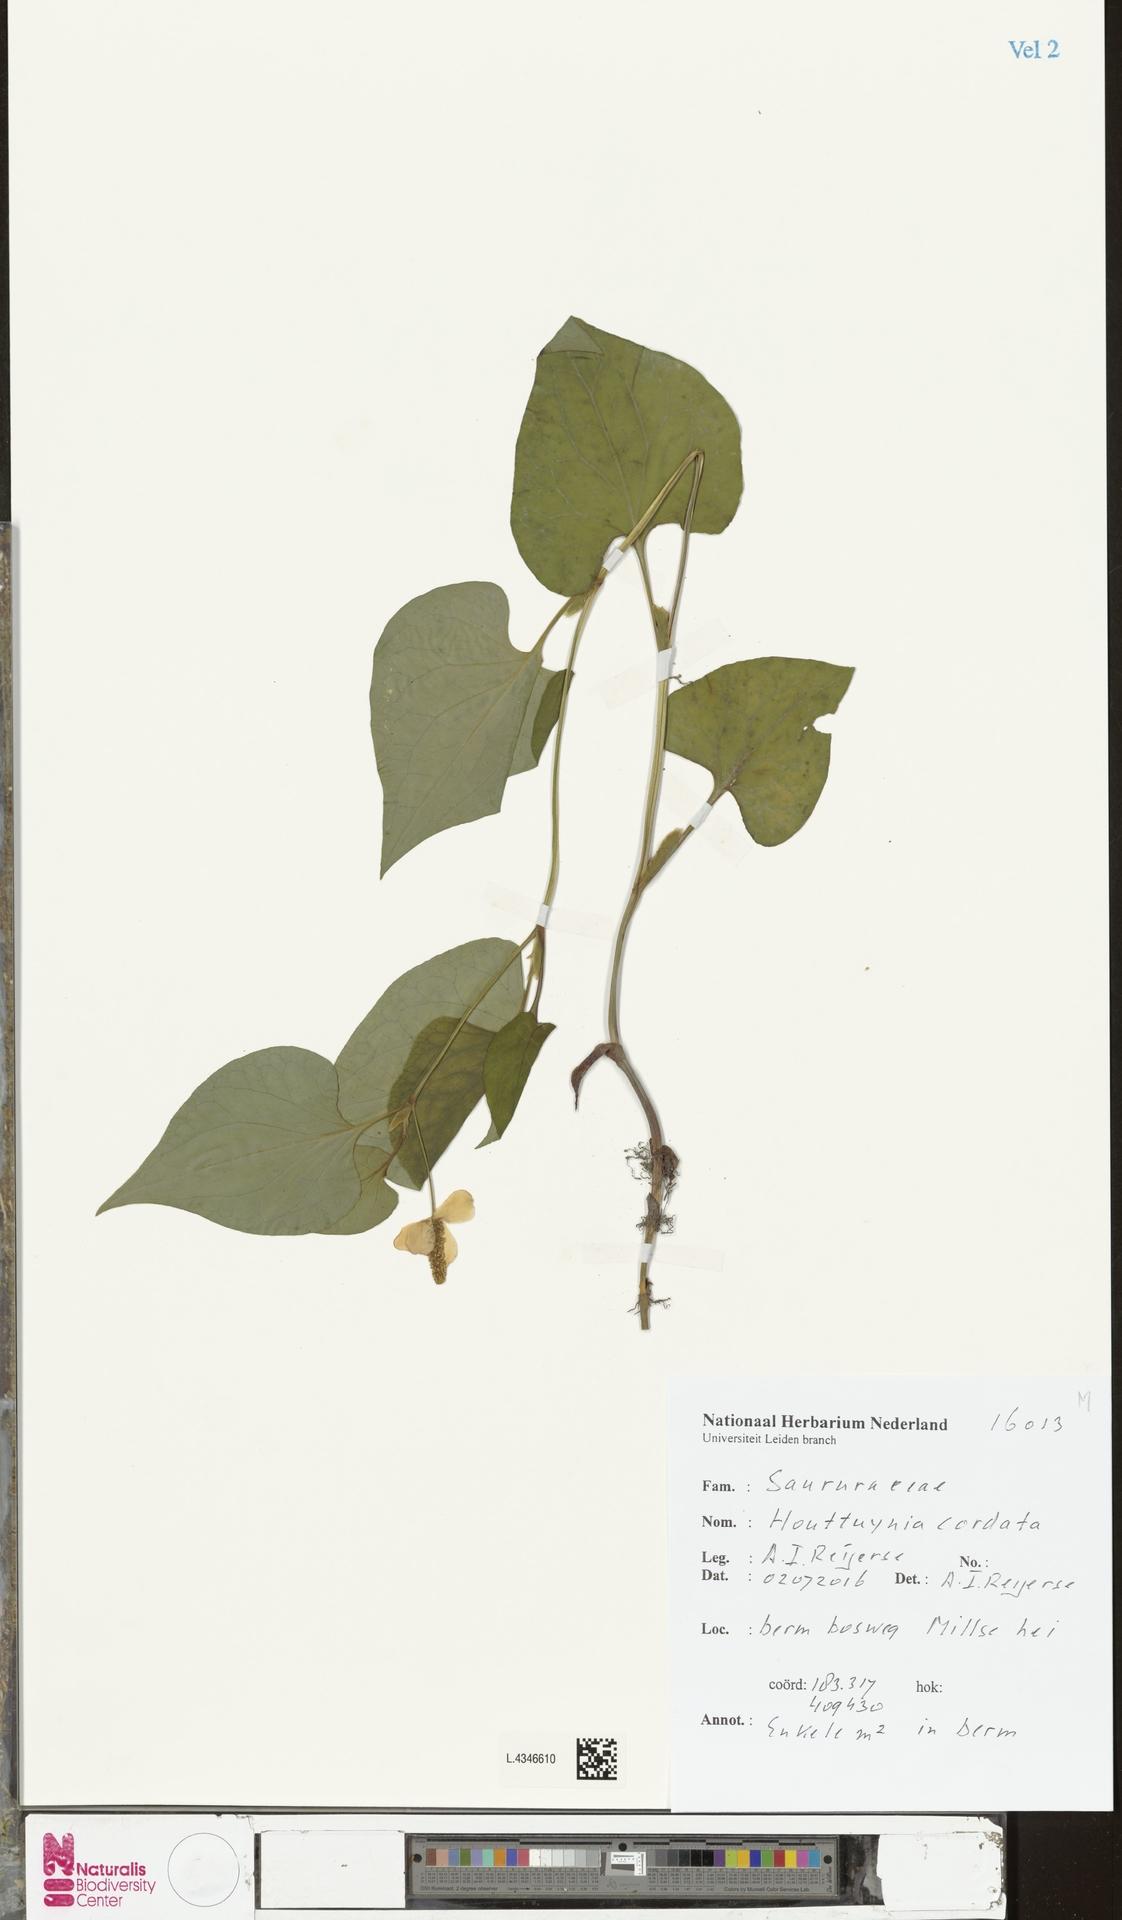 L.4346610   Houttuynia cordata Thunb.